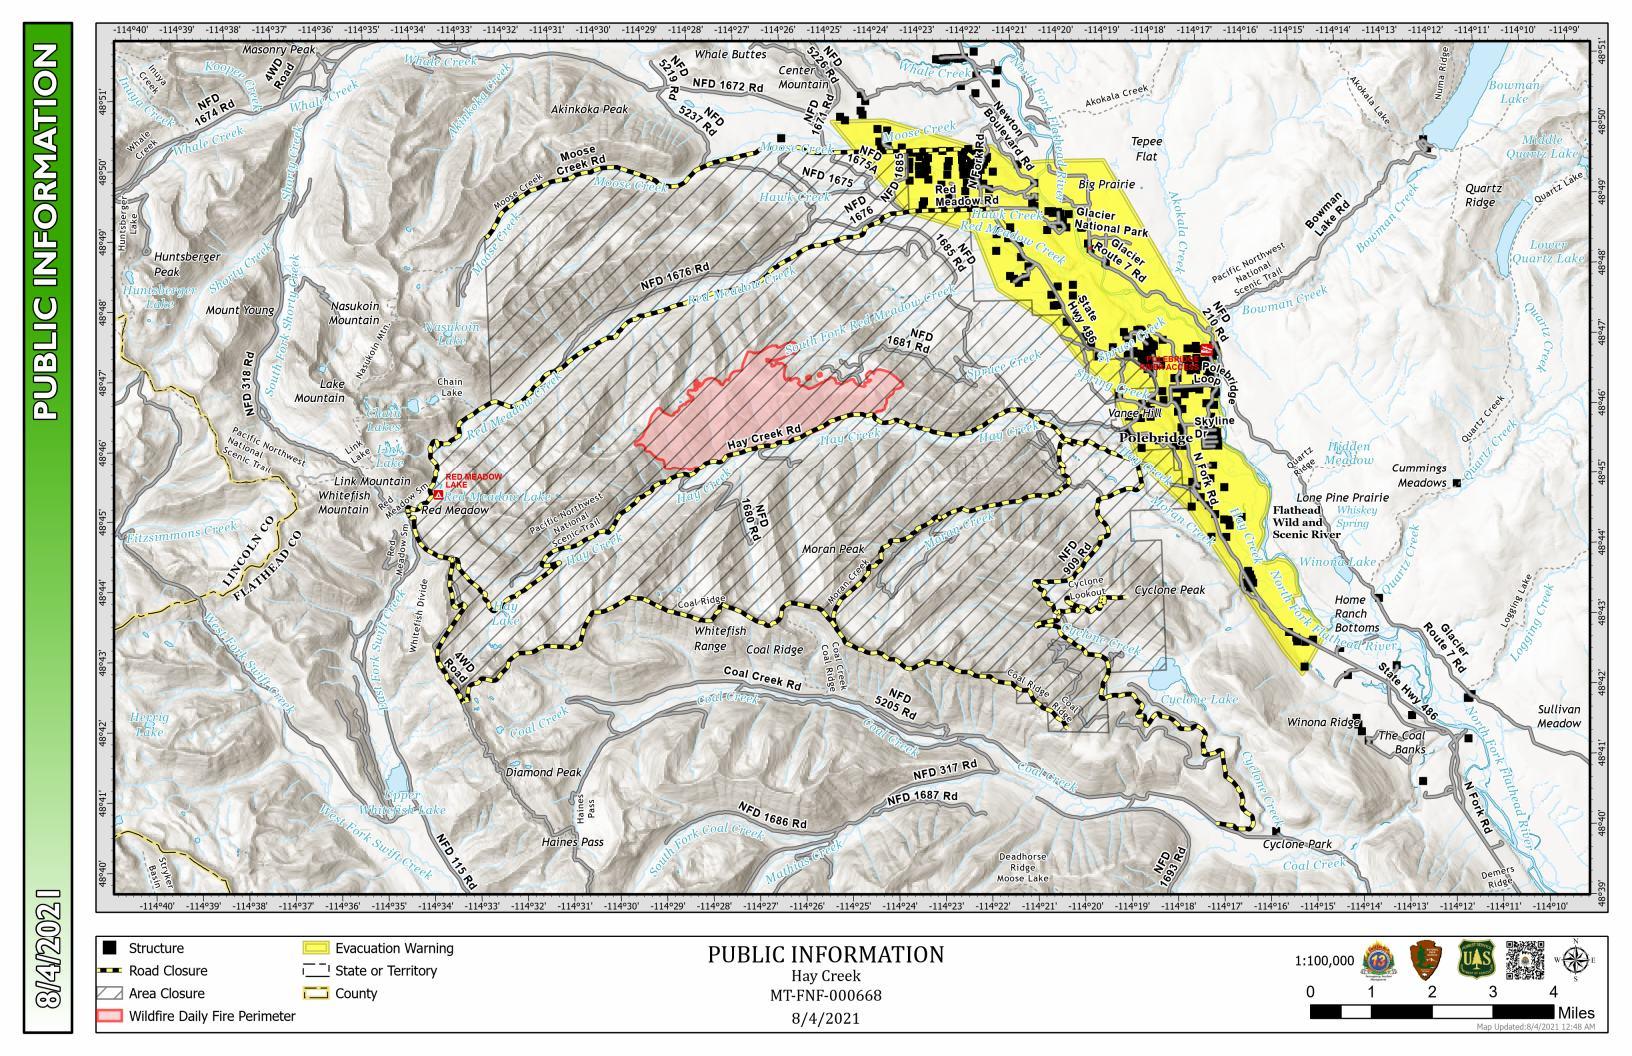 Hay Creek Fire Public Information Map, Aug 4, 2021